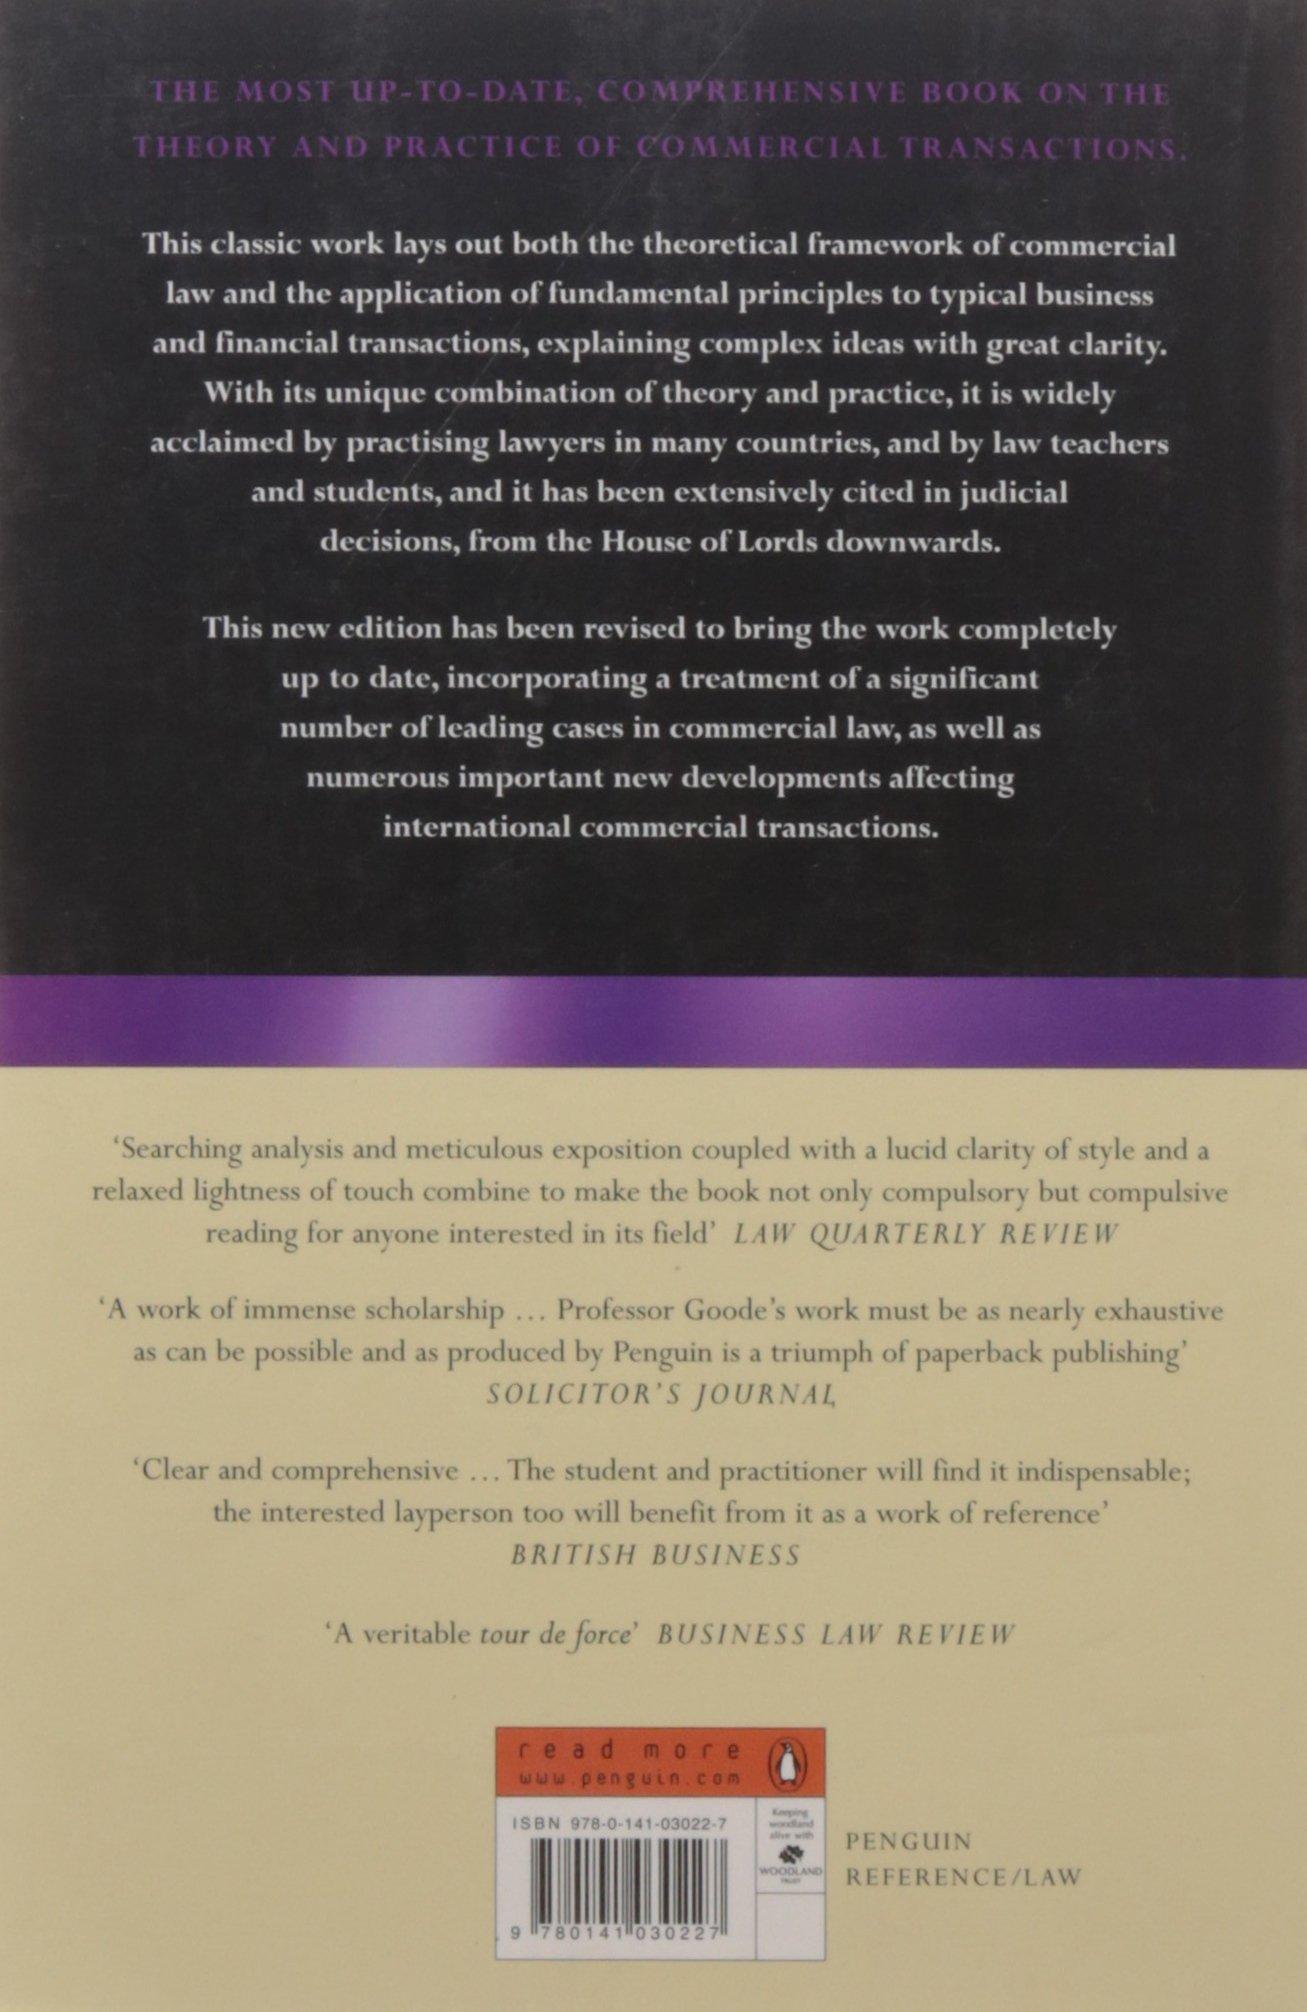 Goode on Commercial Law: Fourth Edition: Amazon.co.uk: Ewan McKendrick, Roy  Goode: 9780141030227: Books